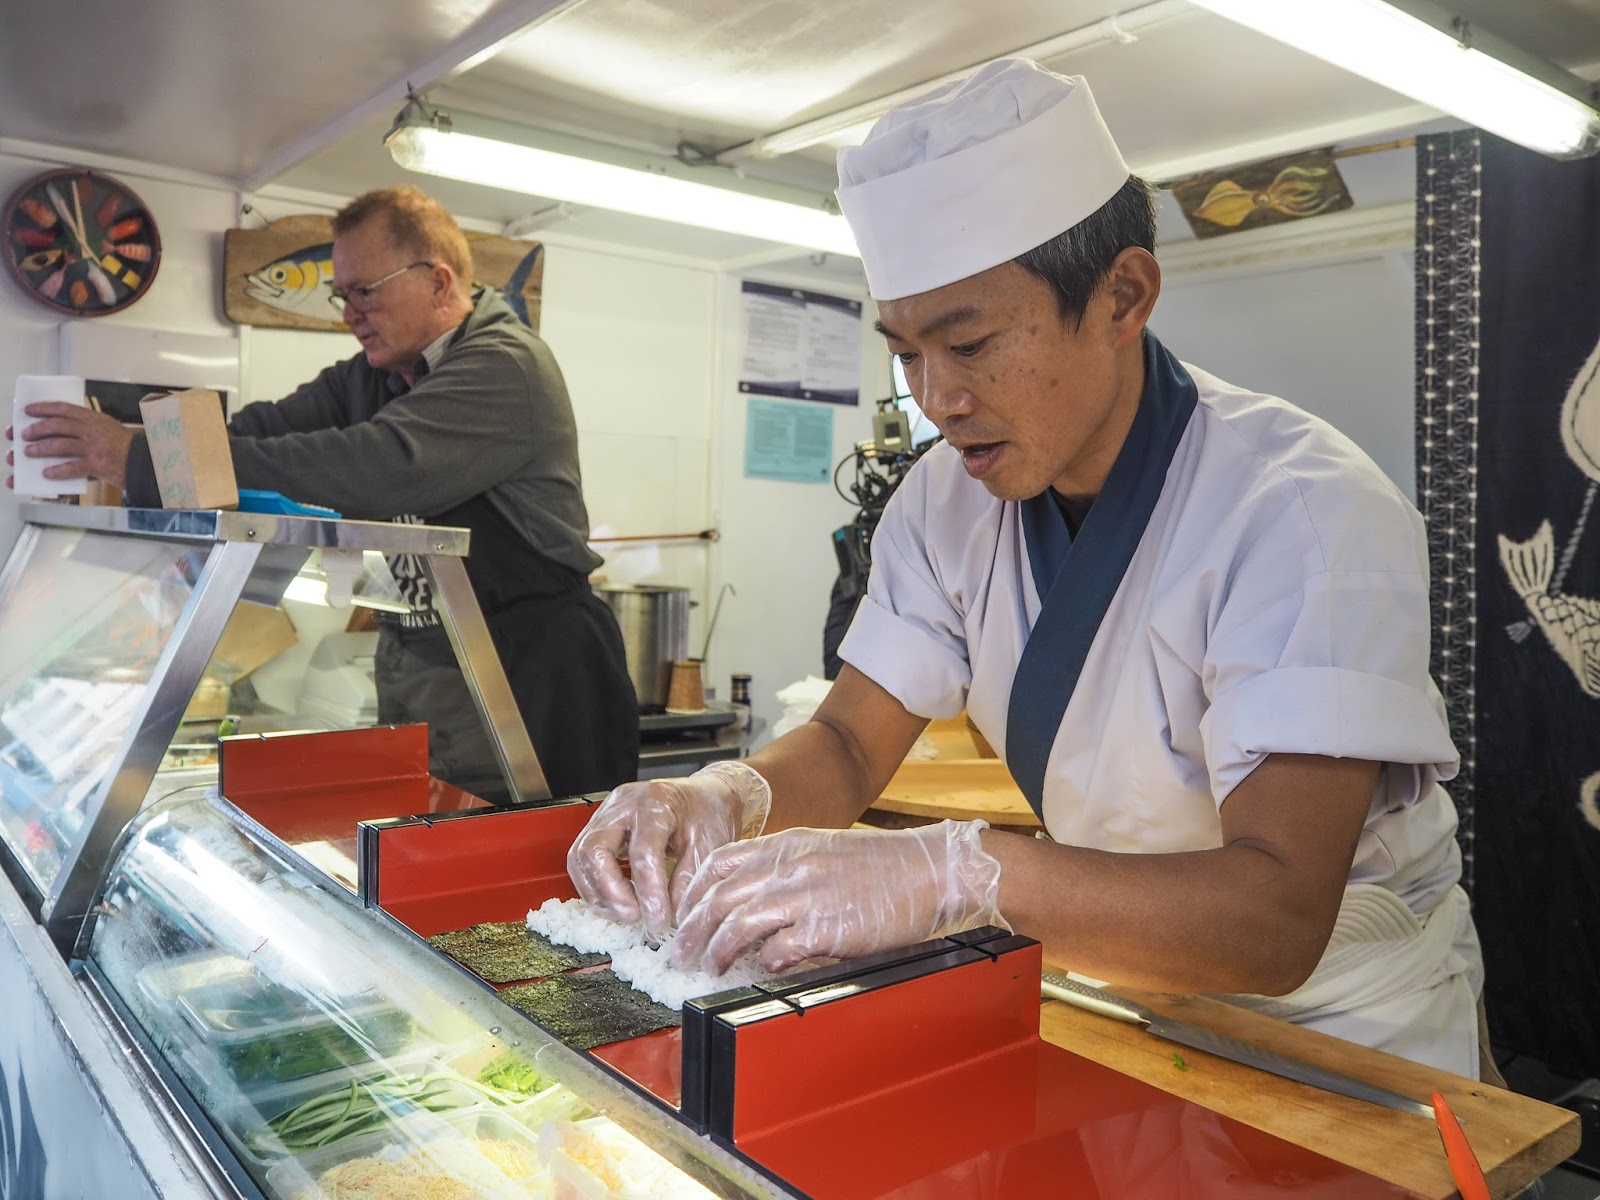 Masaaki yokama making sushi